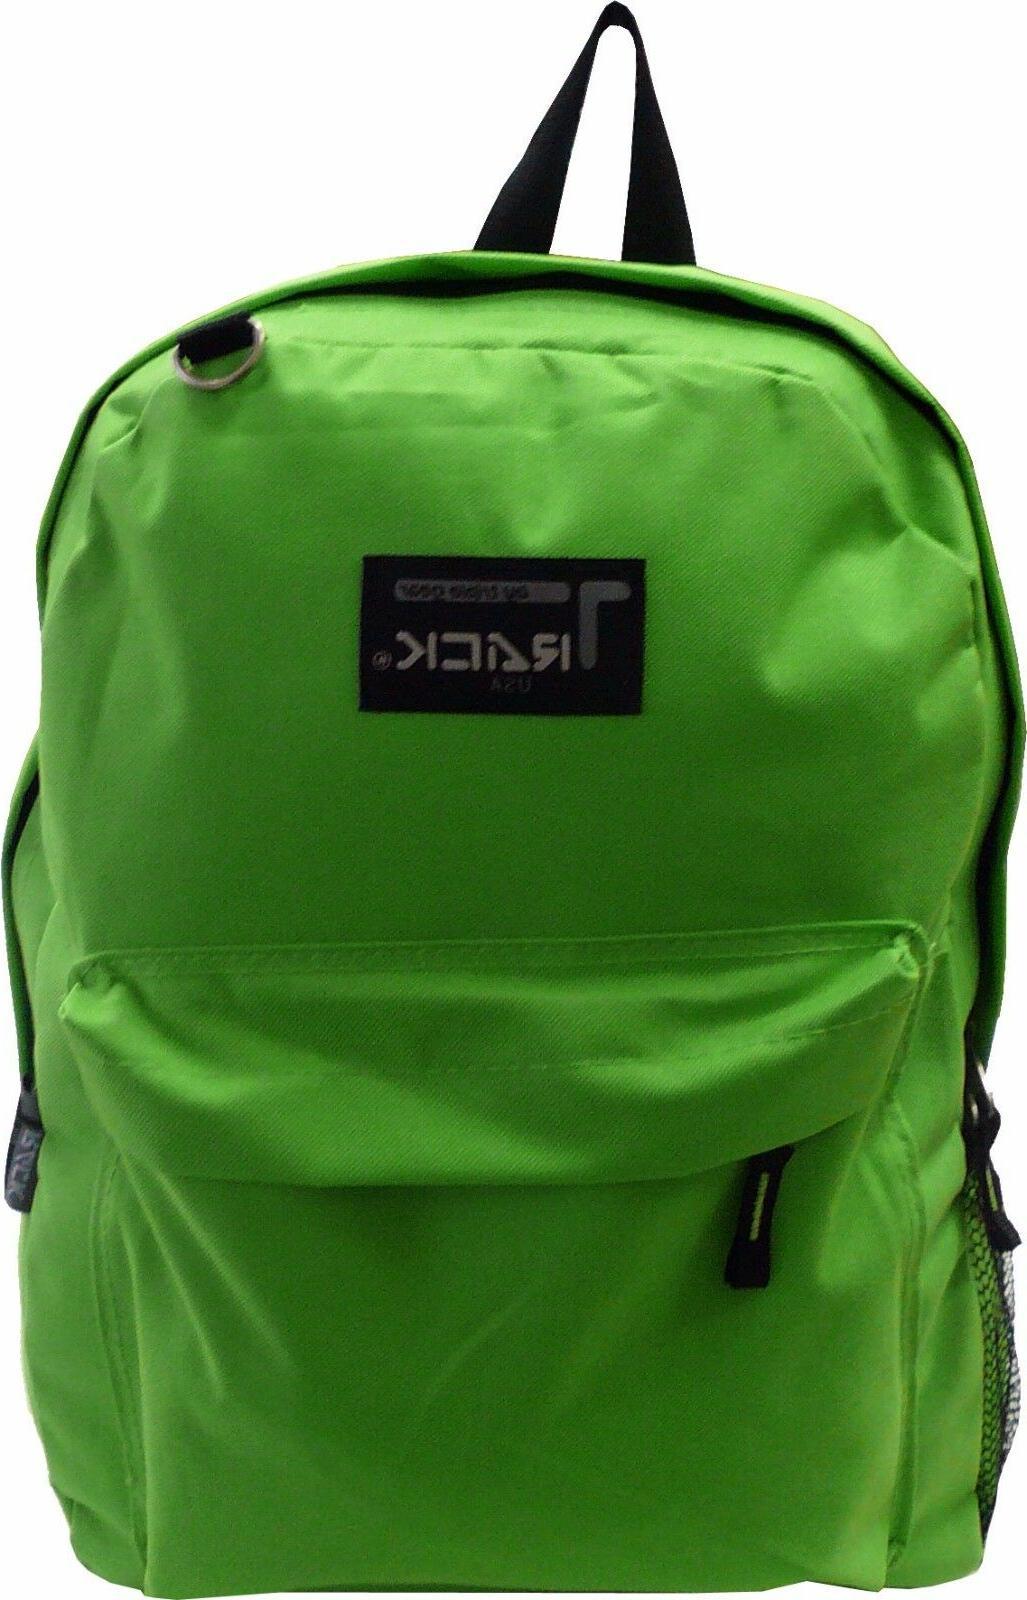 New Emoji School Backpack / Travel Bag /Book